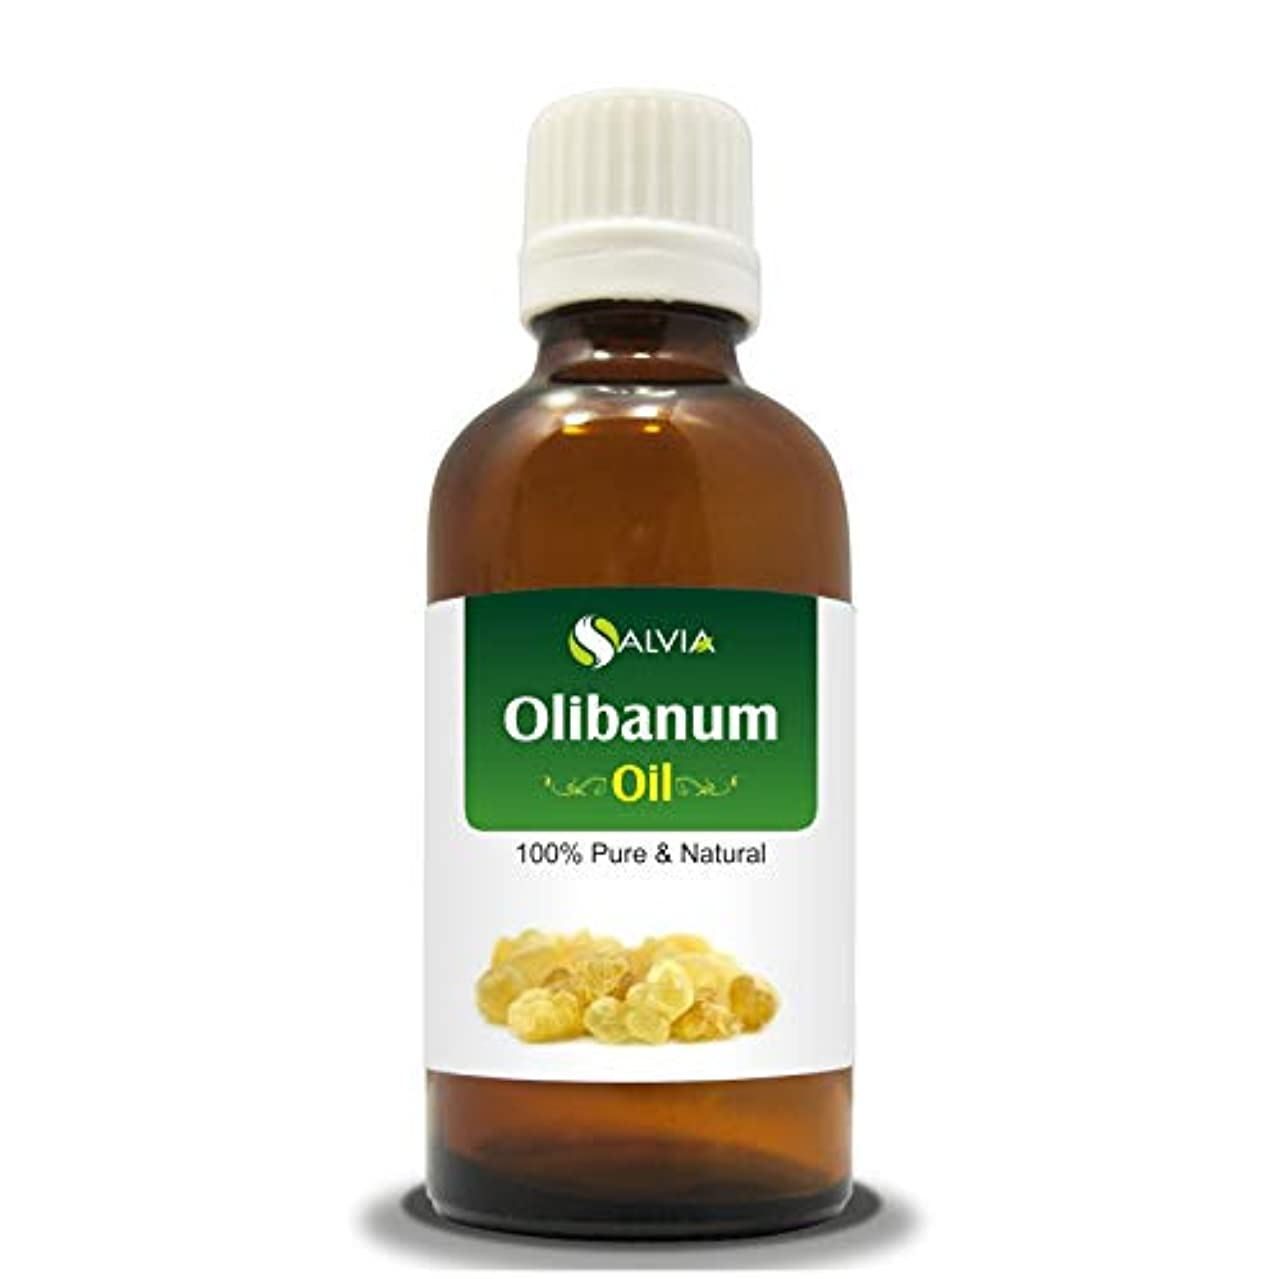 OLIBANUM OIL (BOSWELLIA SERRATA) 100% NATURAL PURE ESSENTIAL OIL 15ML